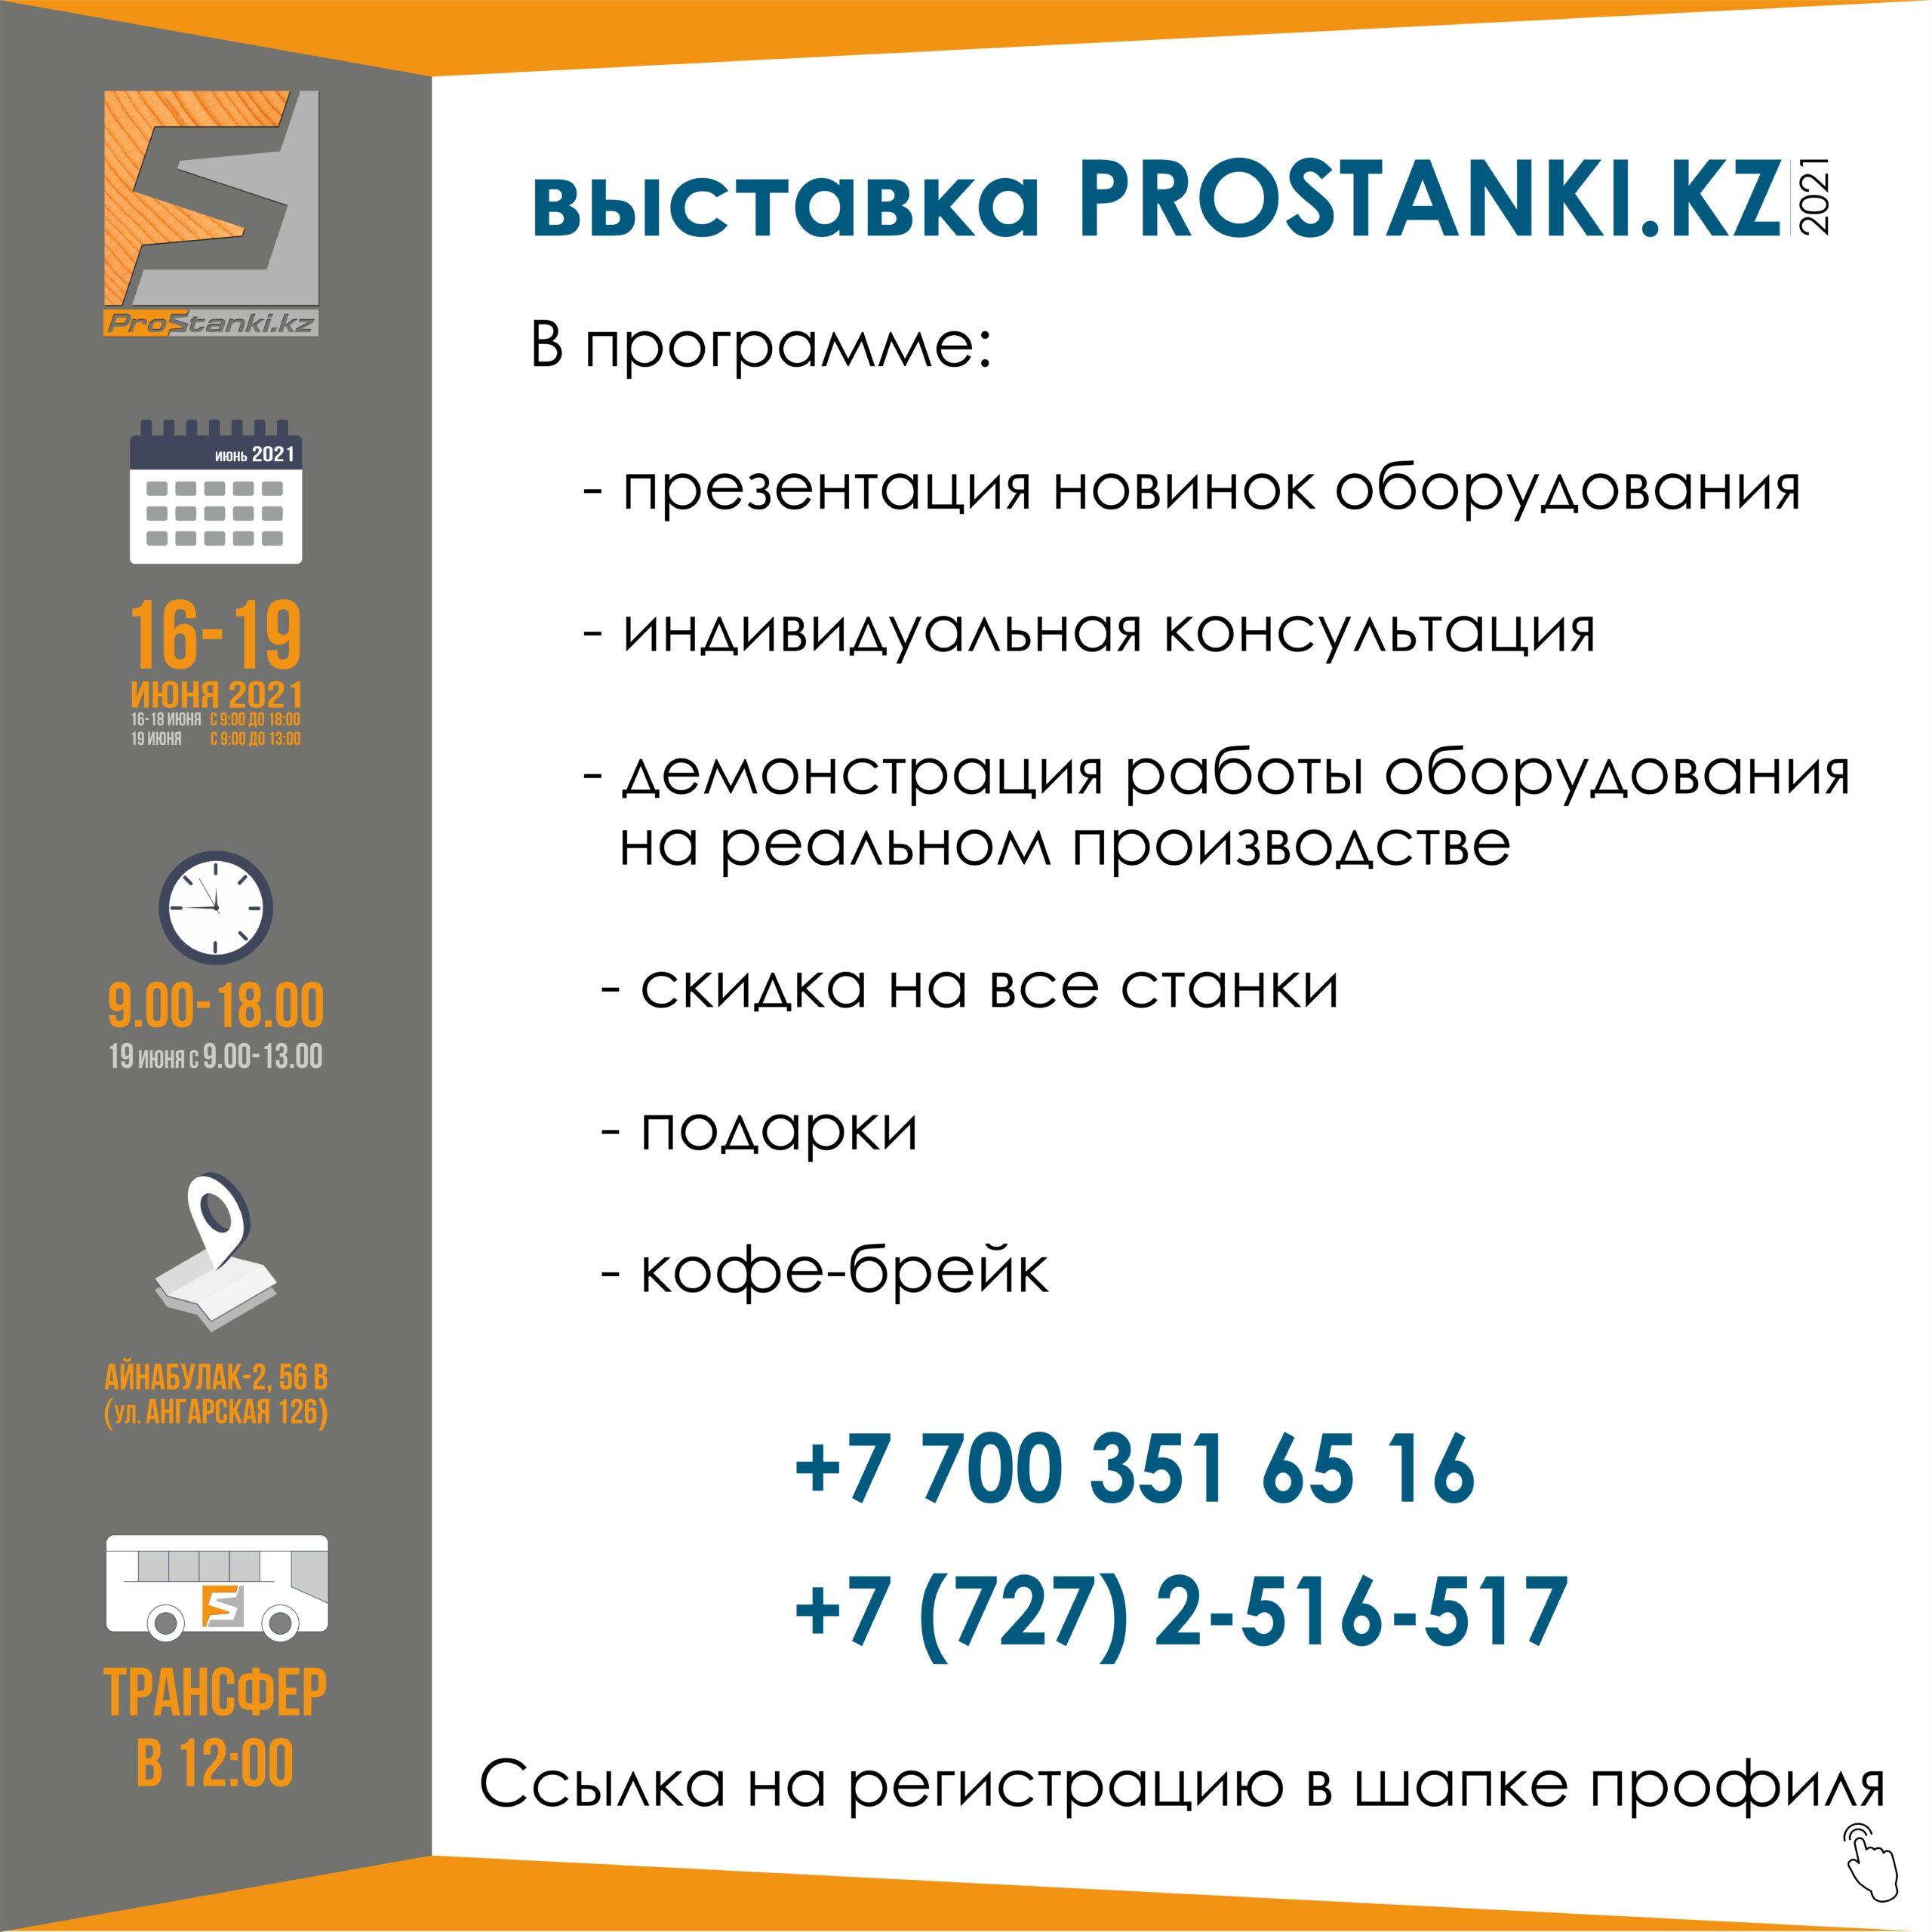 Приглашаем Вас на домашнюю выставку «Prostanki.kz-2021»!